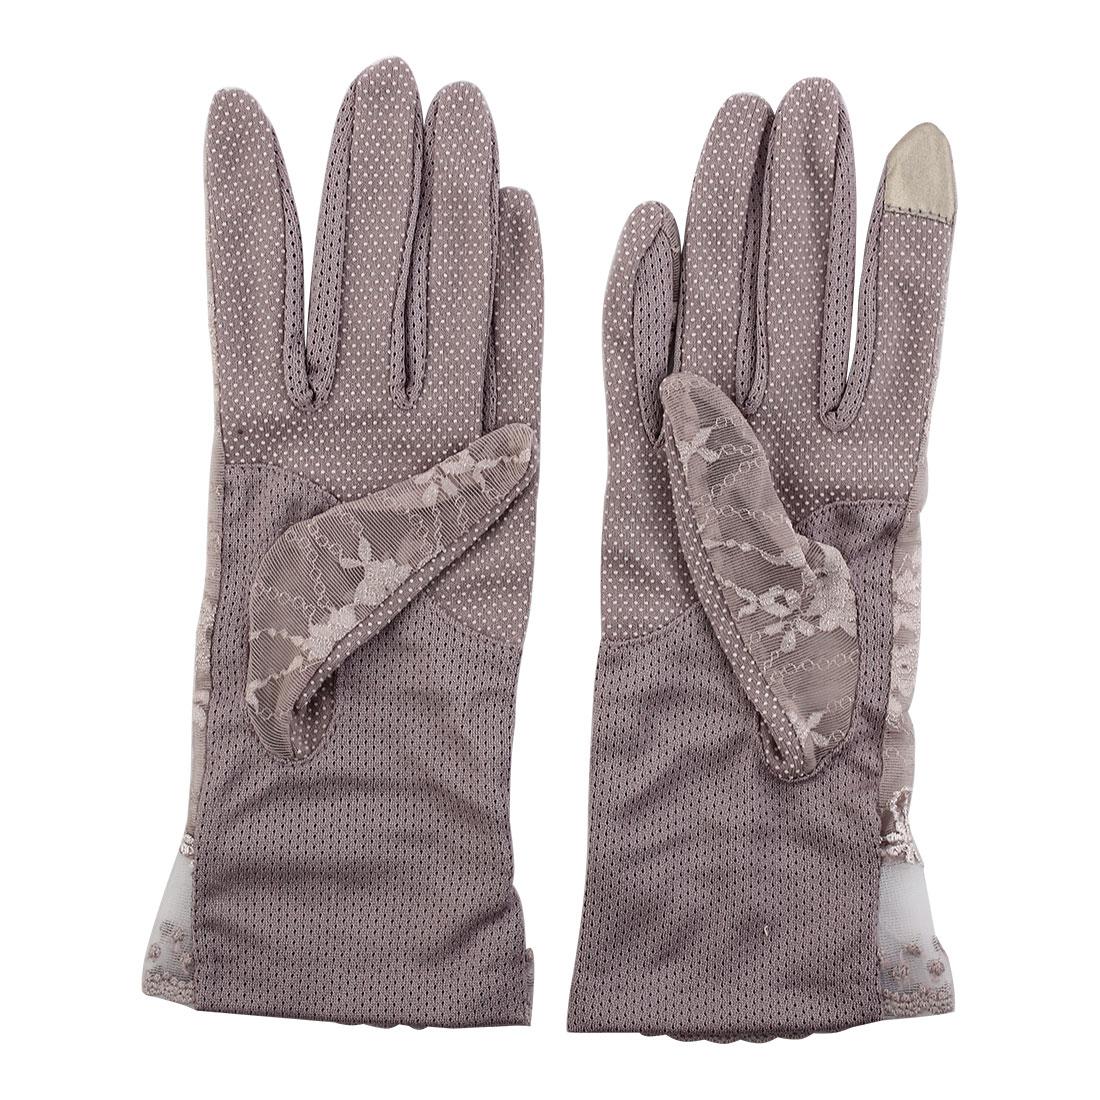 Outdoor Travel Driving Flower Lace Decor Wrist Length Full Finger Sun Resistant Gloves Purple Pair for Women